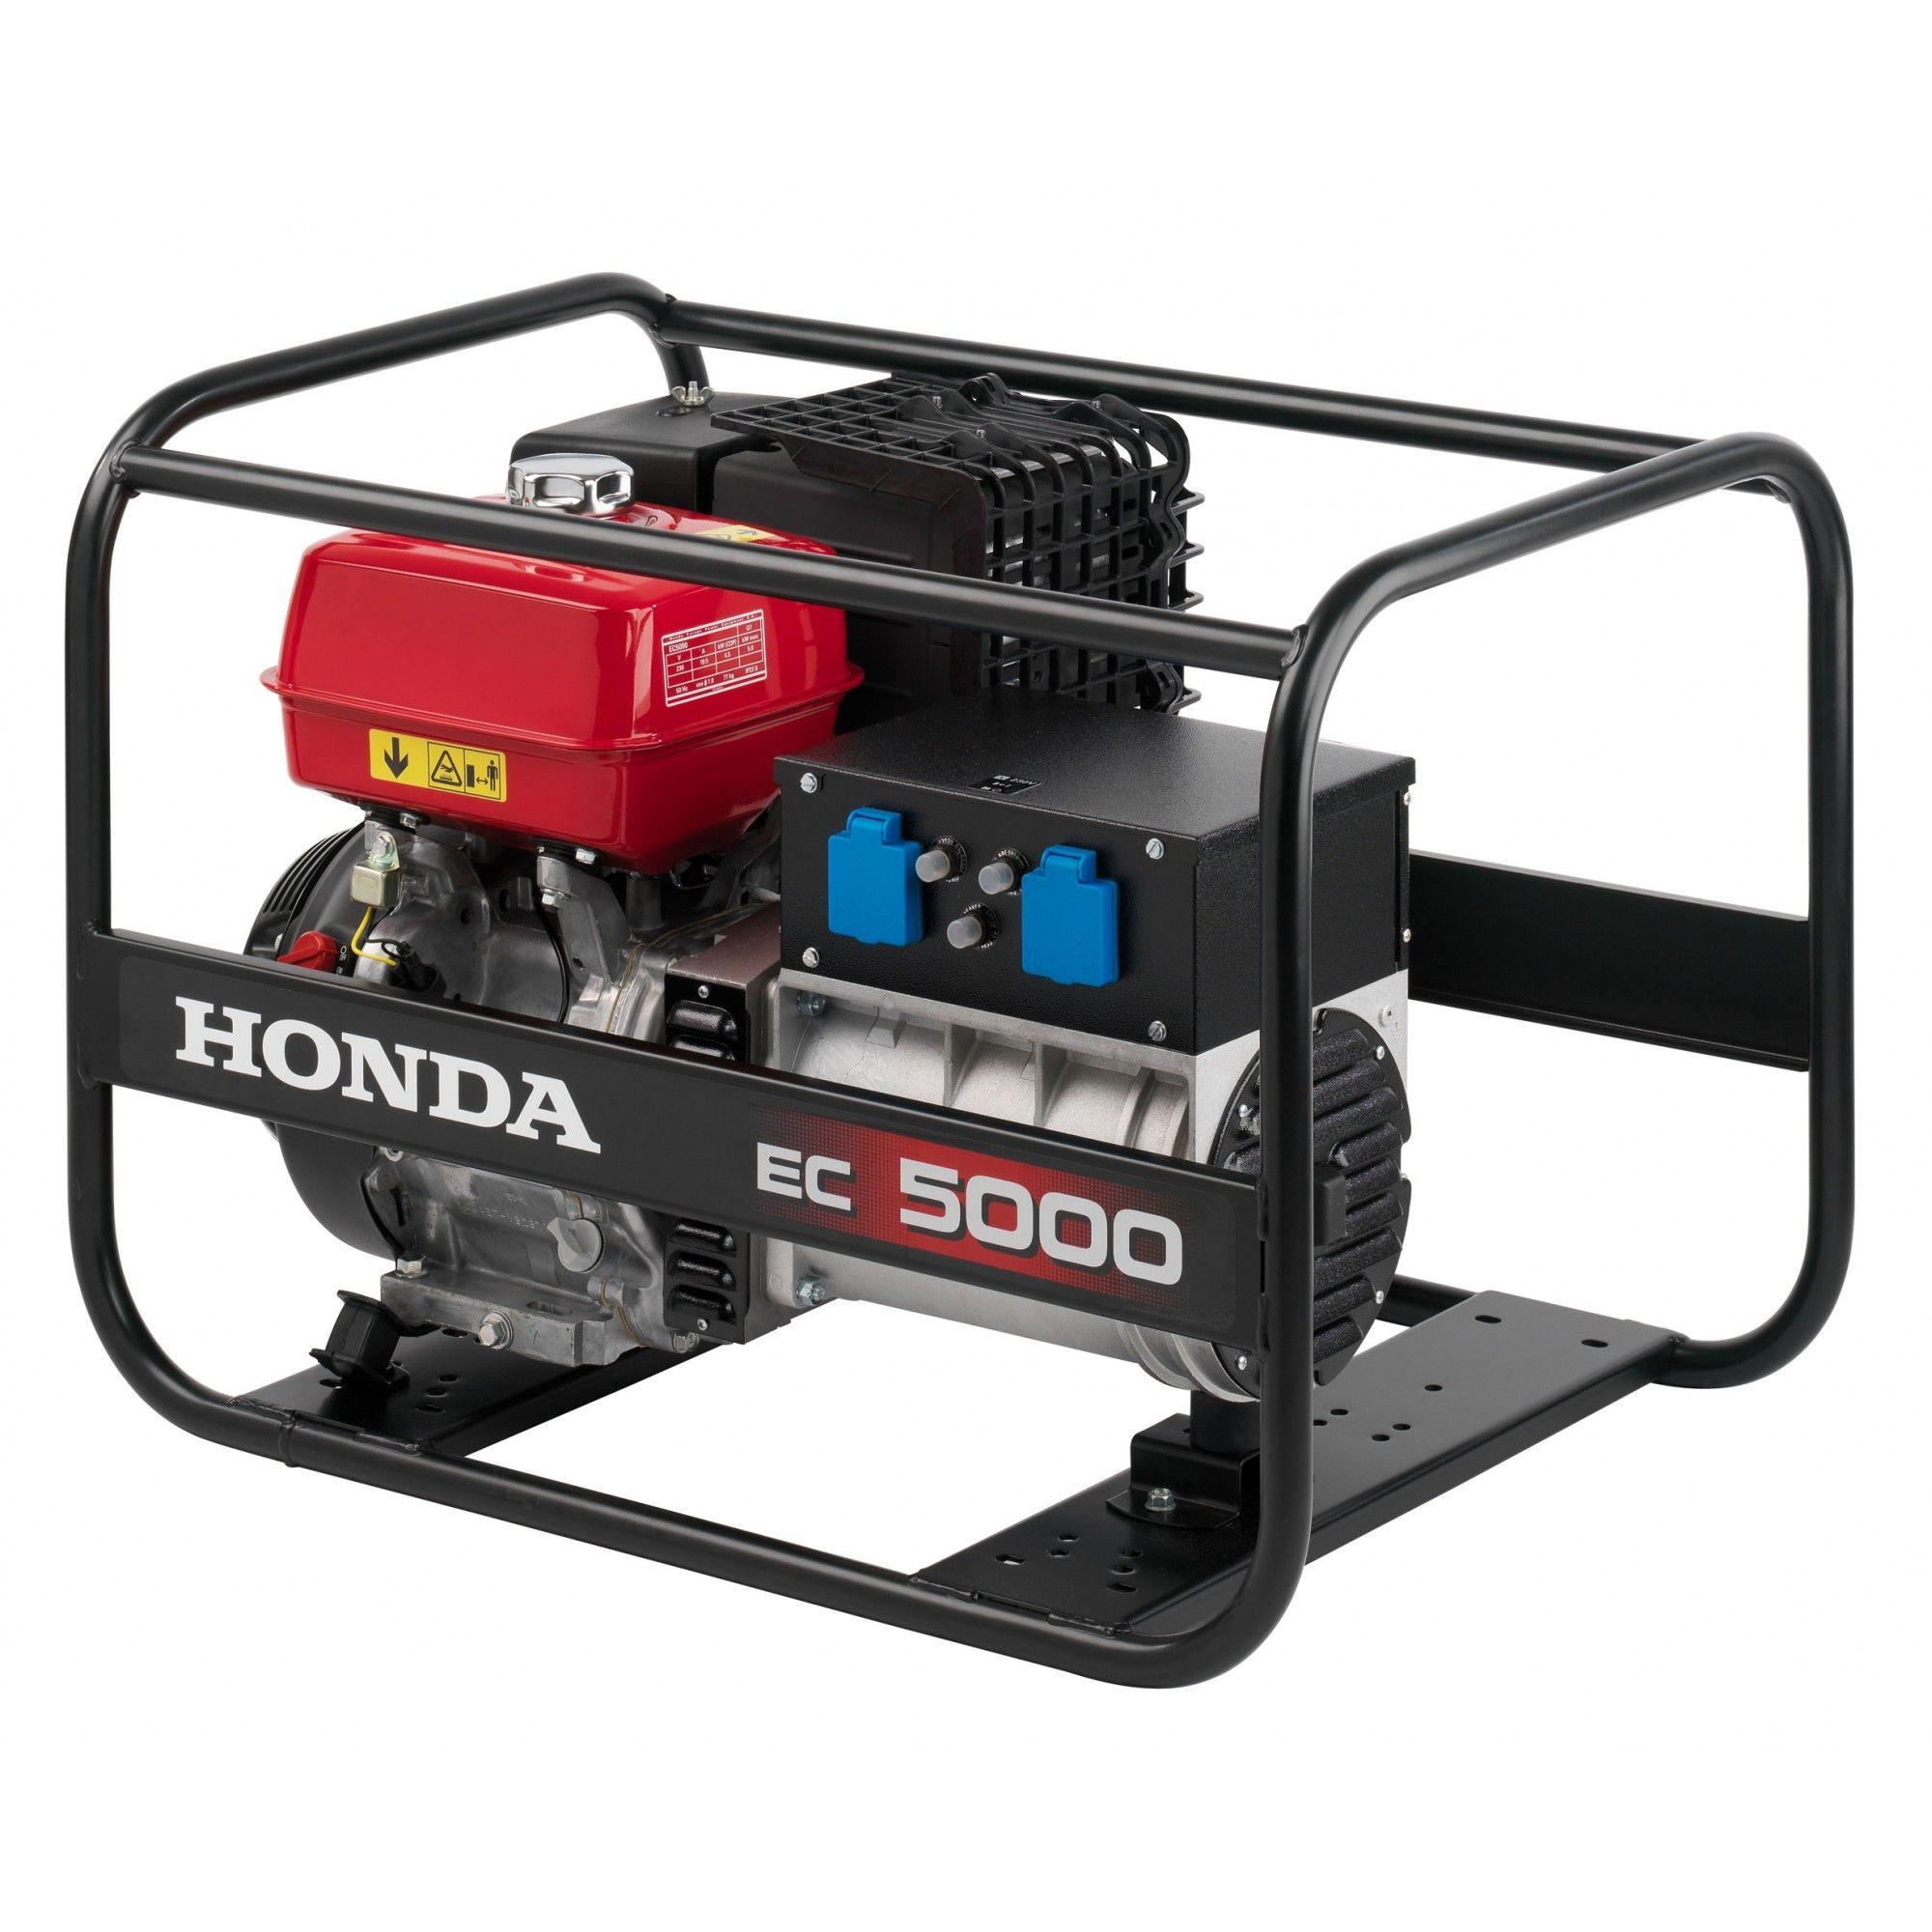 Honda EC 5000 duurzaam aggregaat/generator